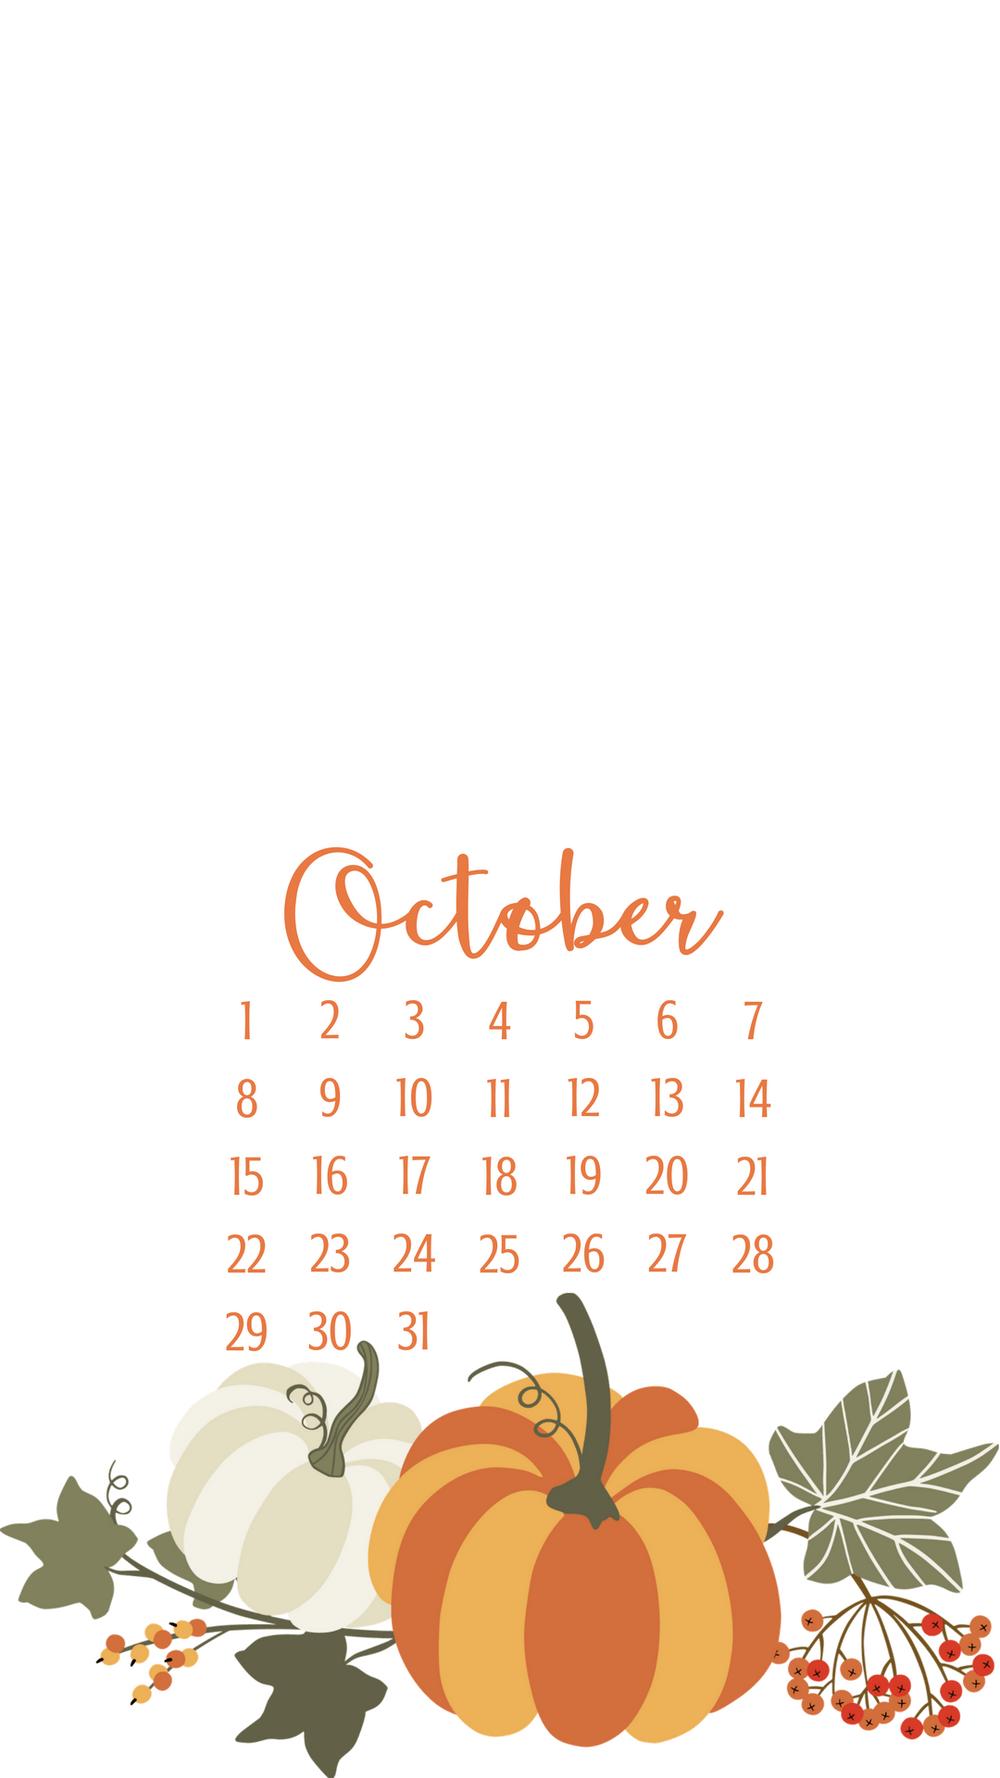 October Smart Phone Wallpapers Autumn phone wallpaper